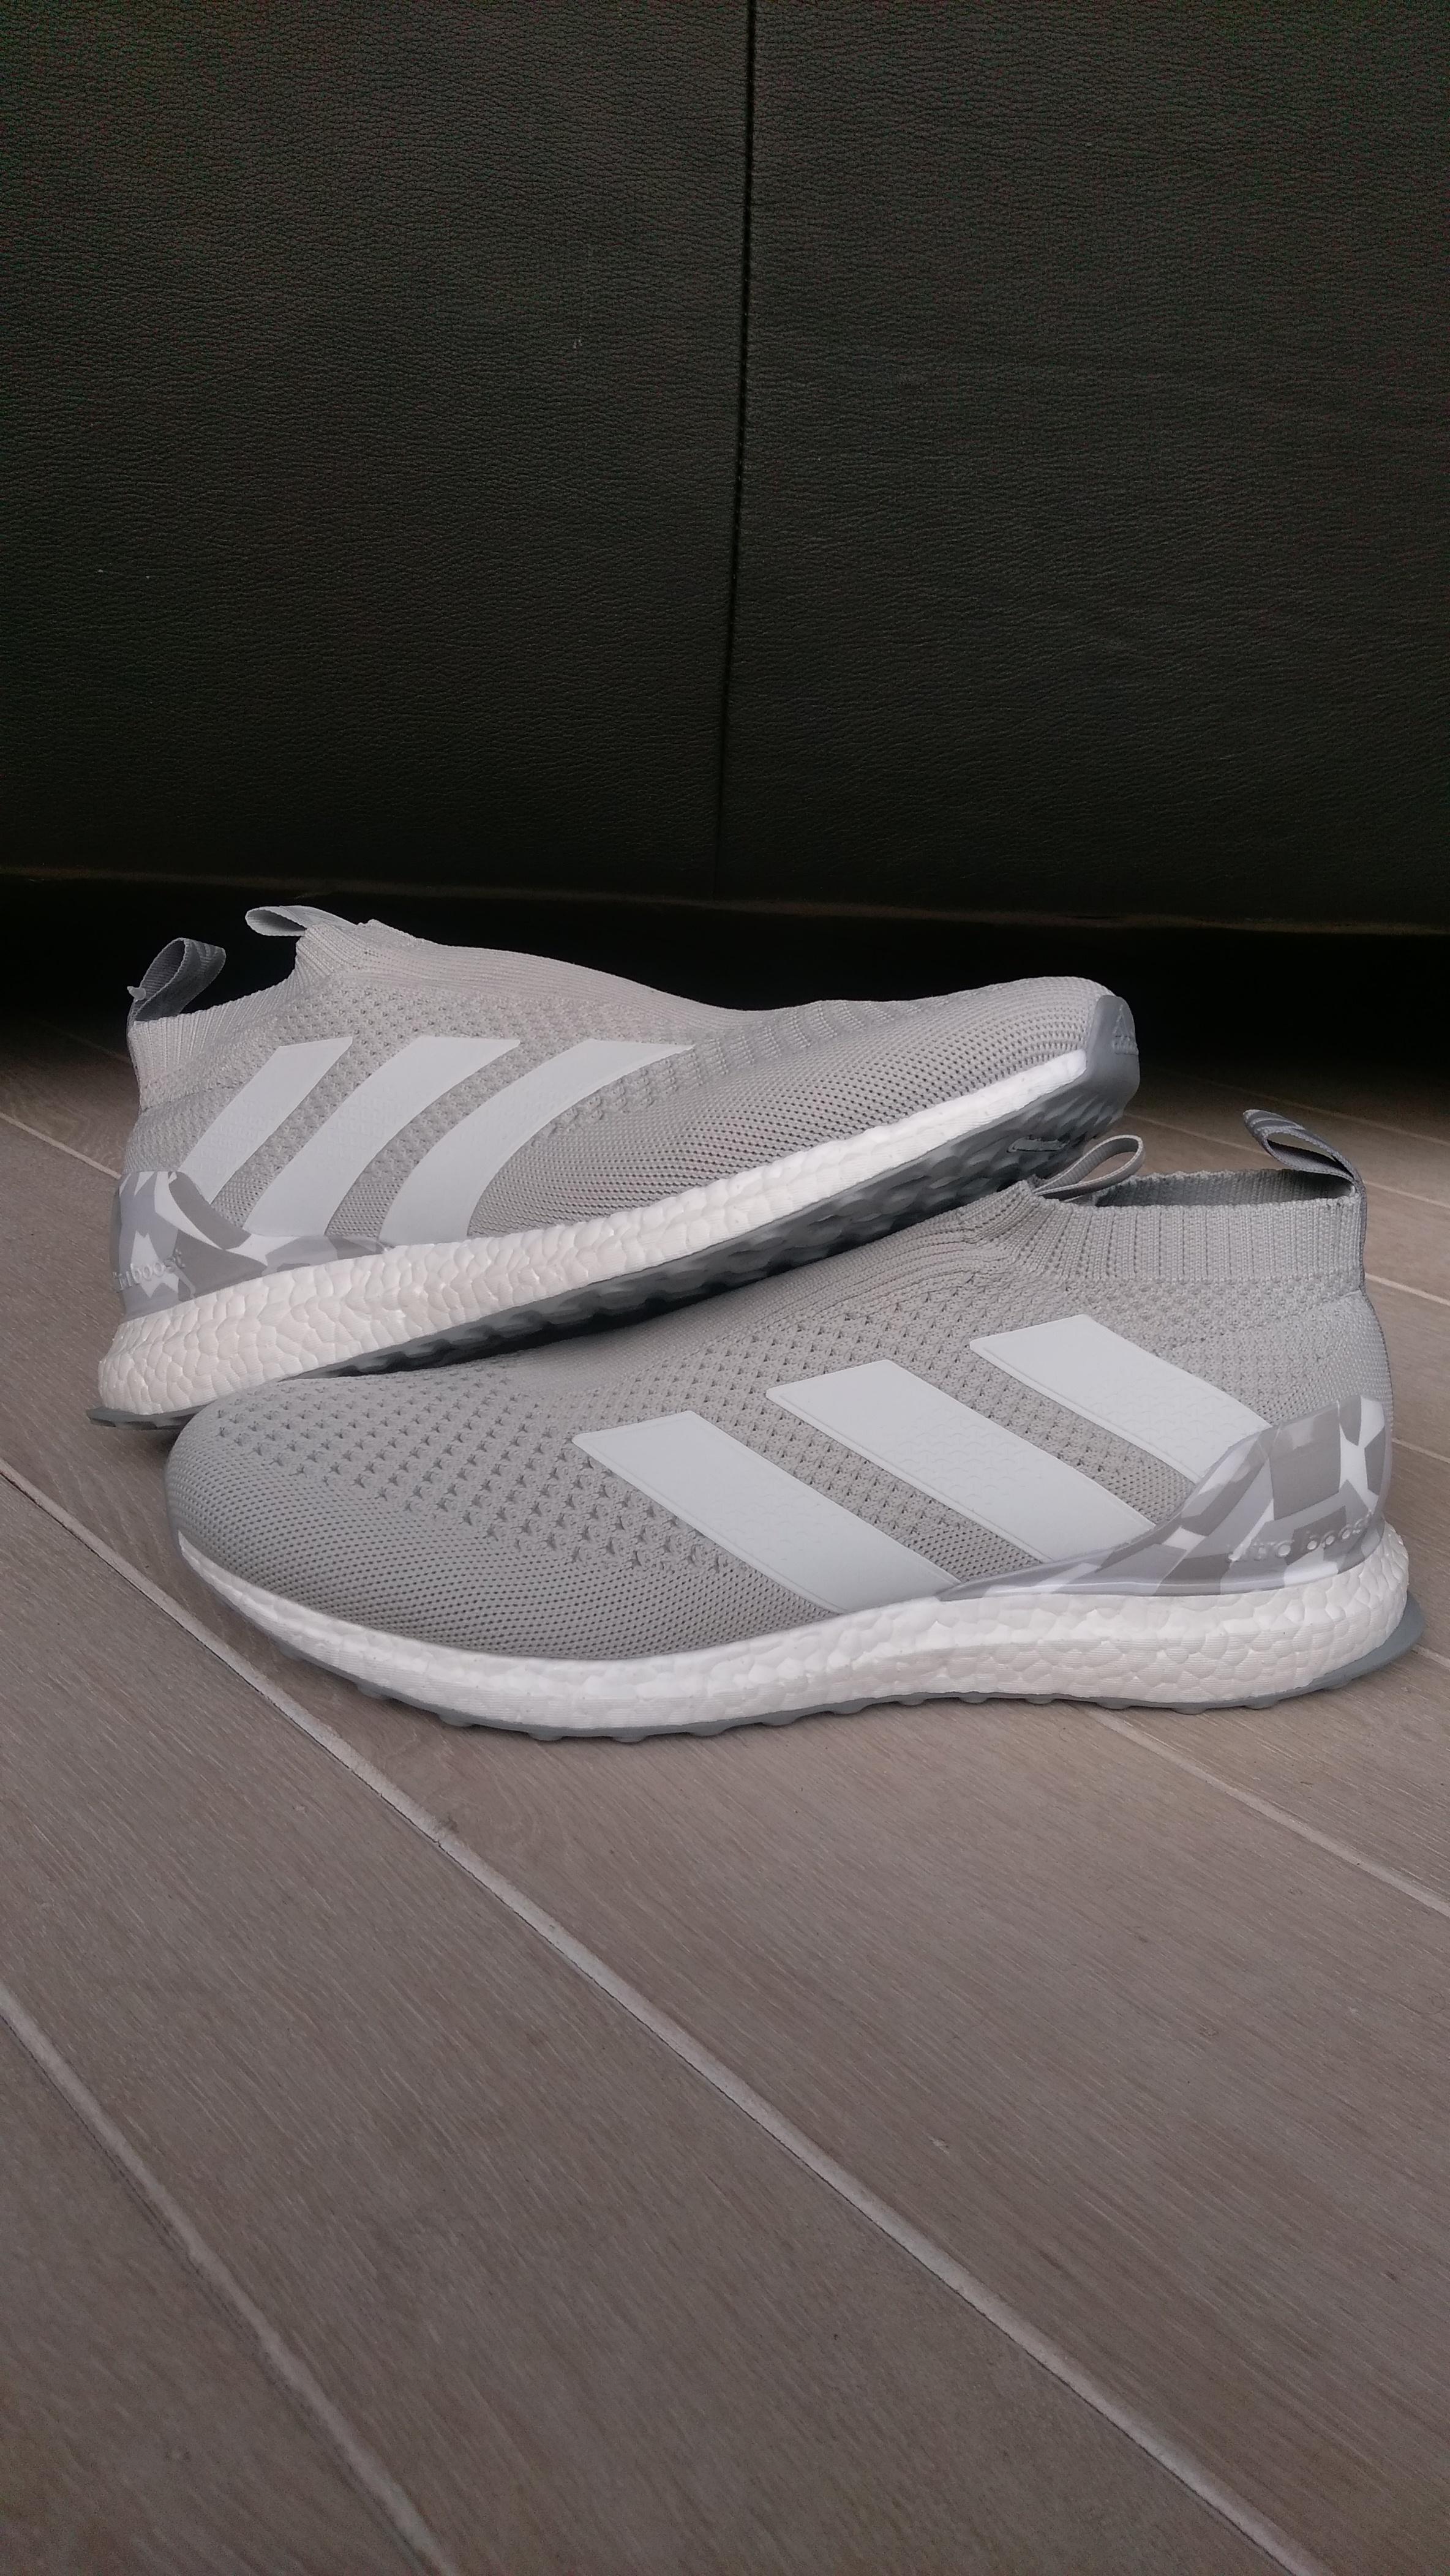 big sale 908e2 2f989 Adidas. Adidas Ace 16+ PureControl Ultra Boost (Camo Grey)